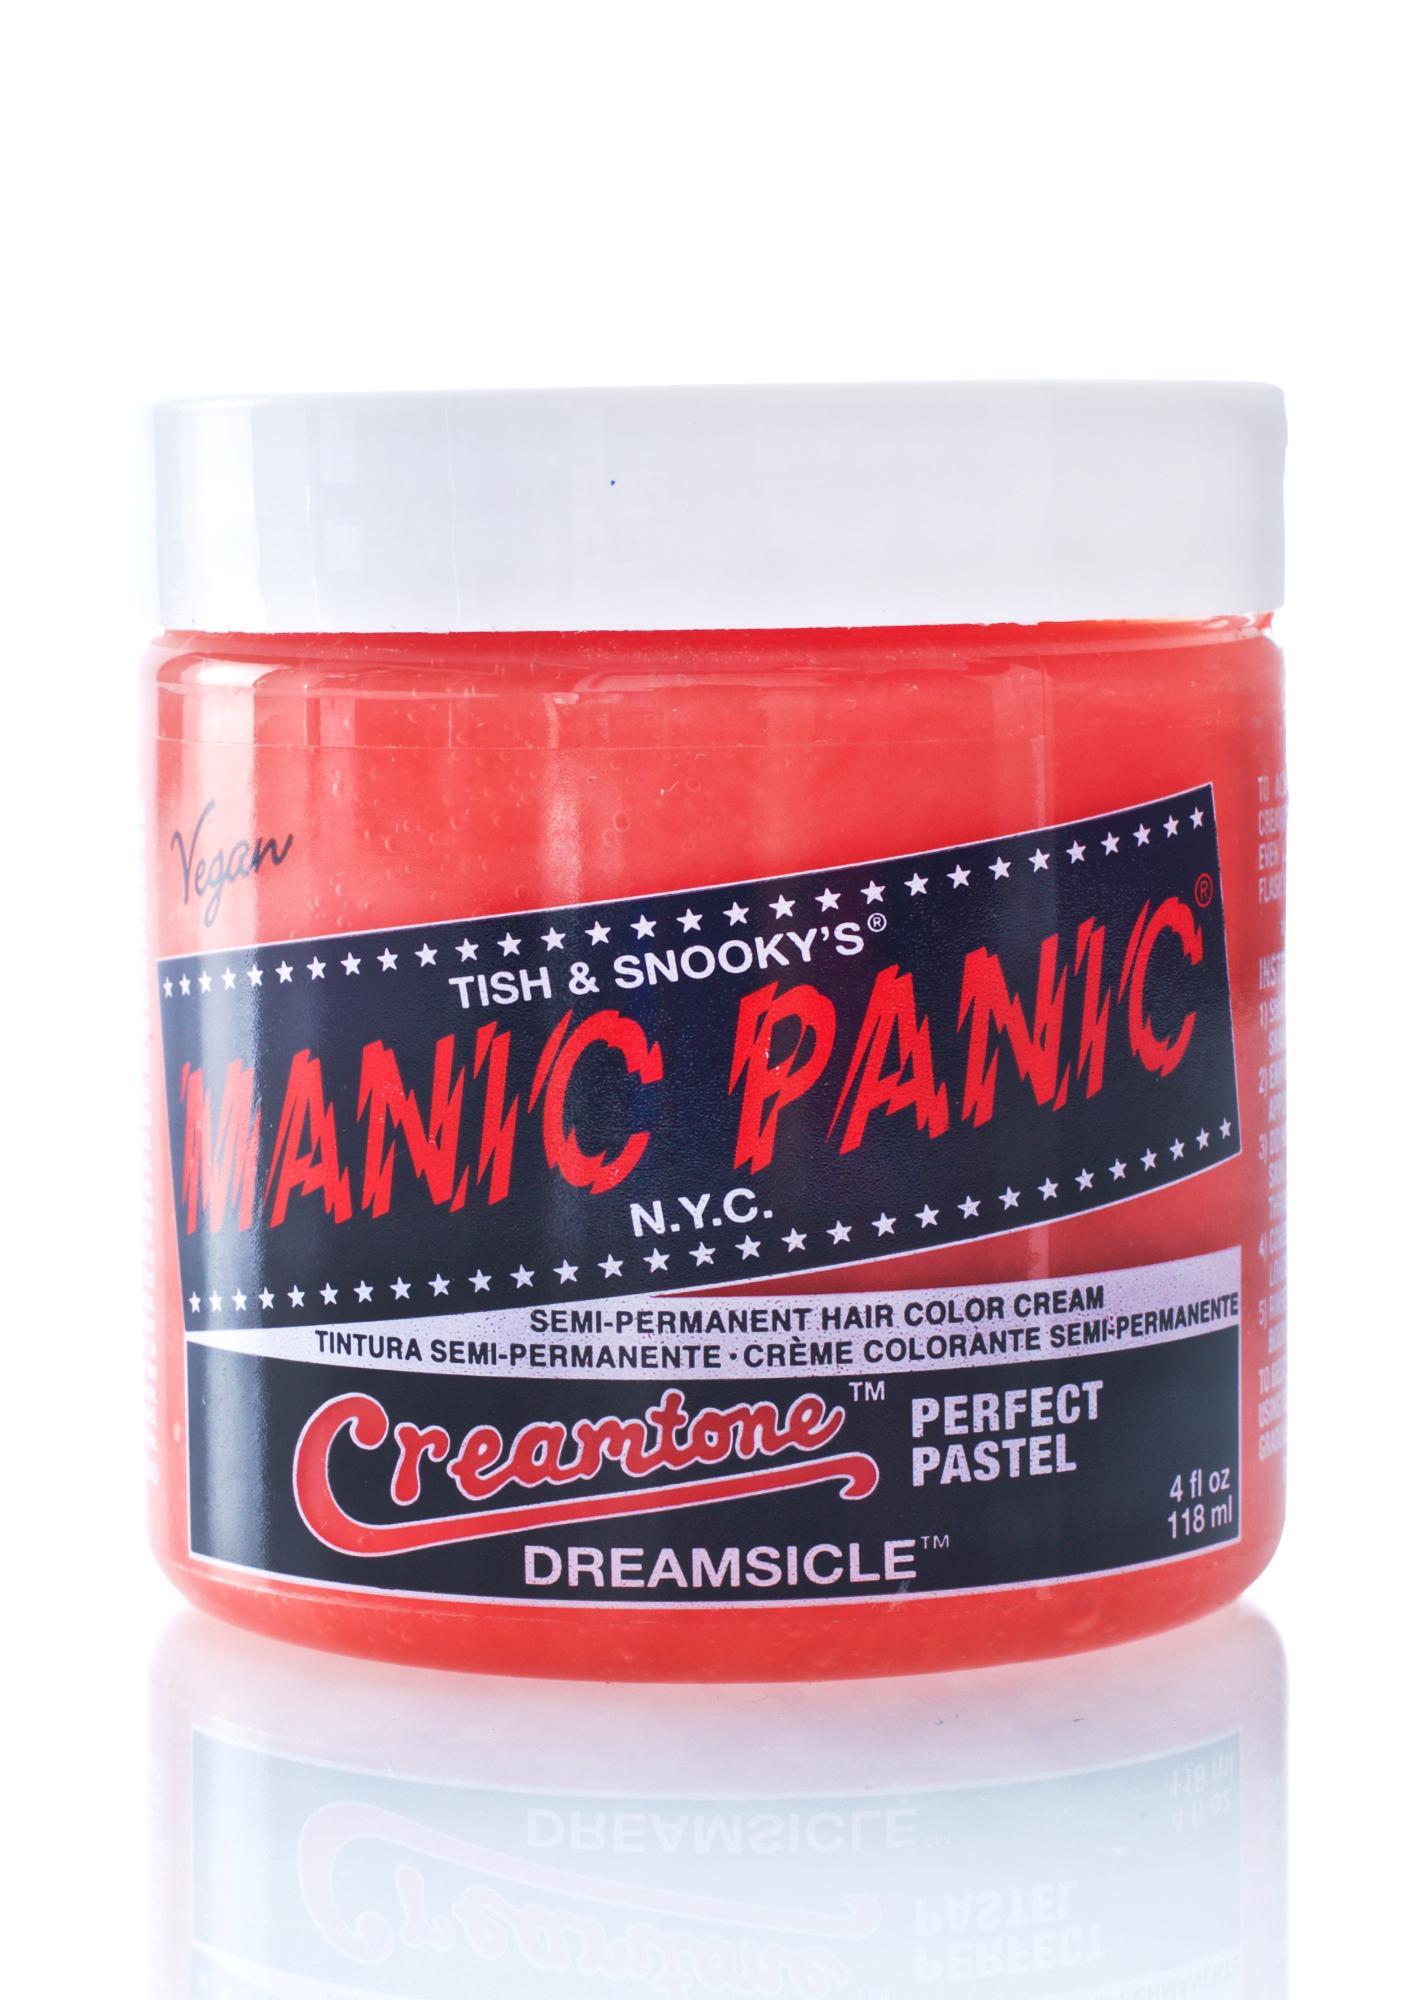 Manic Panic Dreamsicle Creamtone Hair Dye